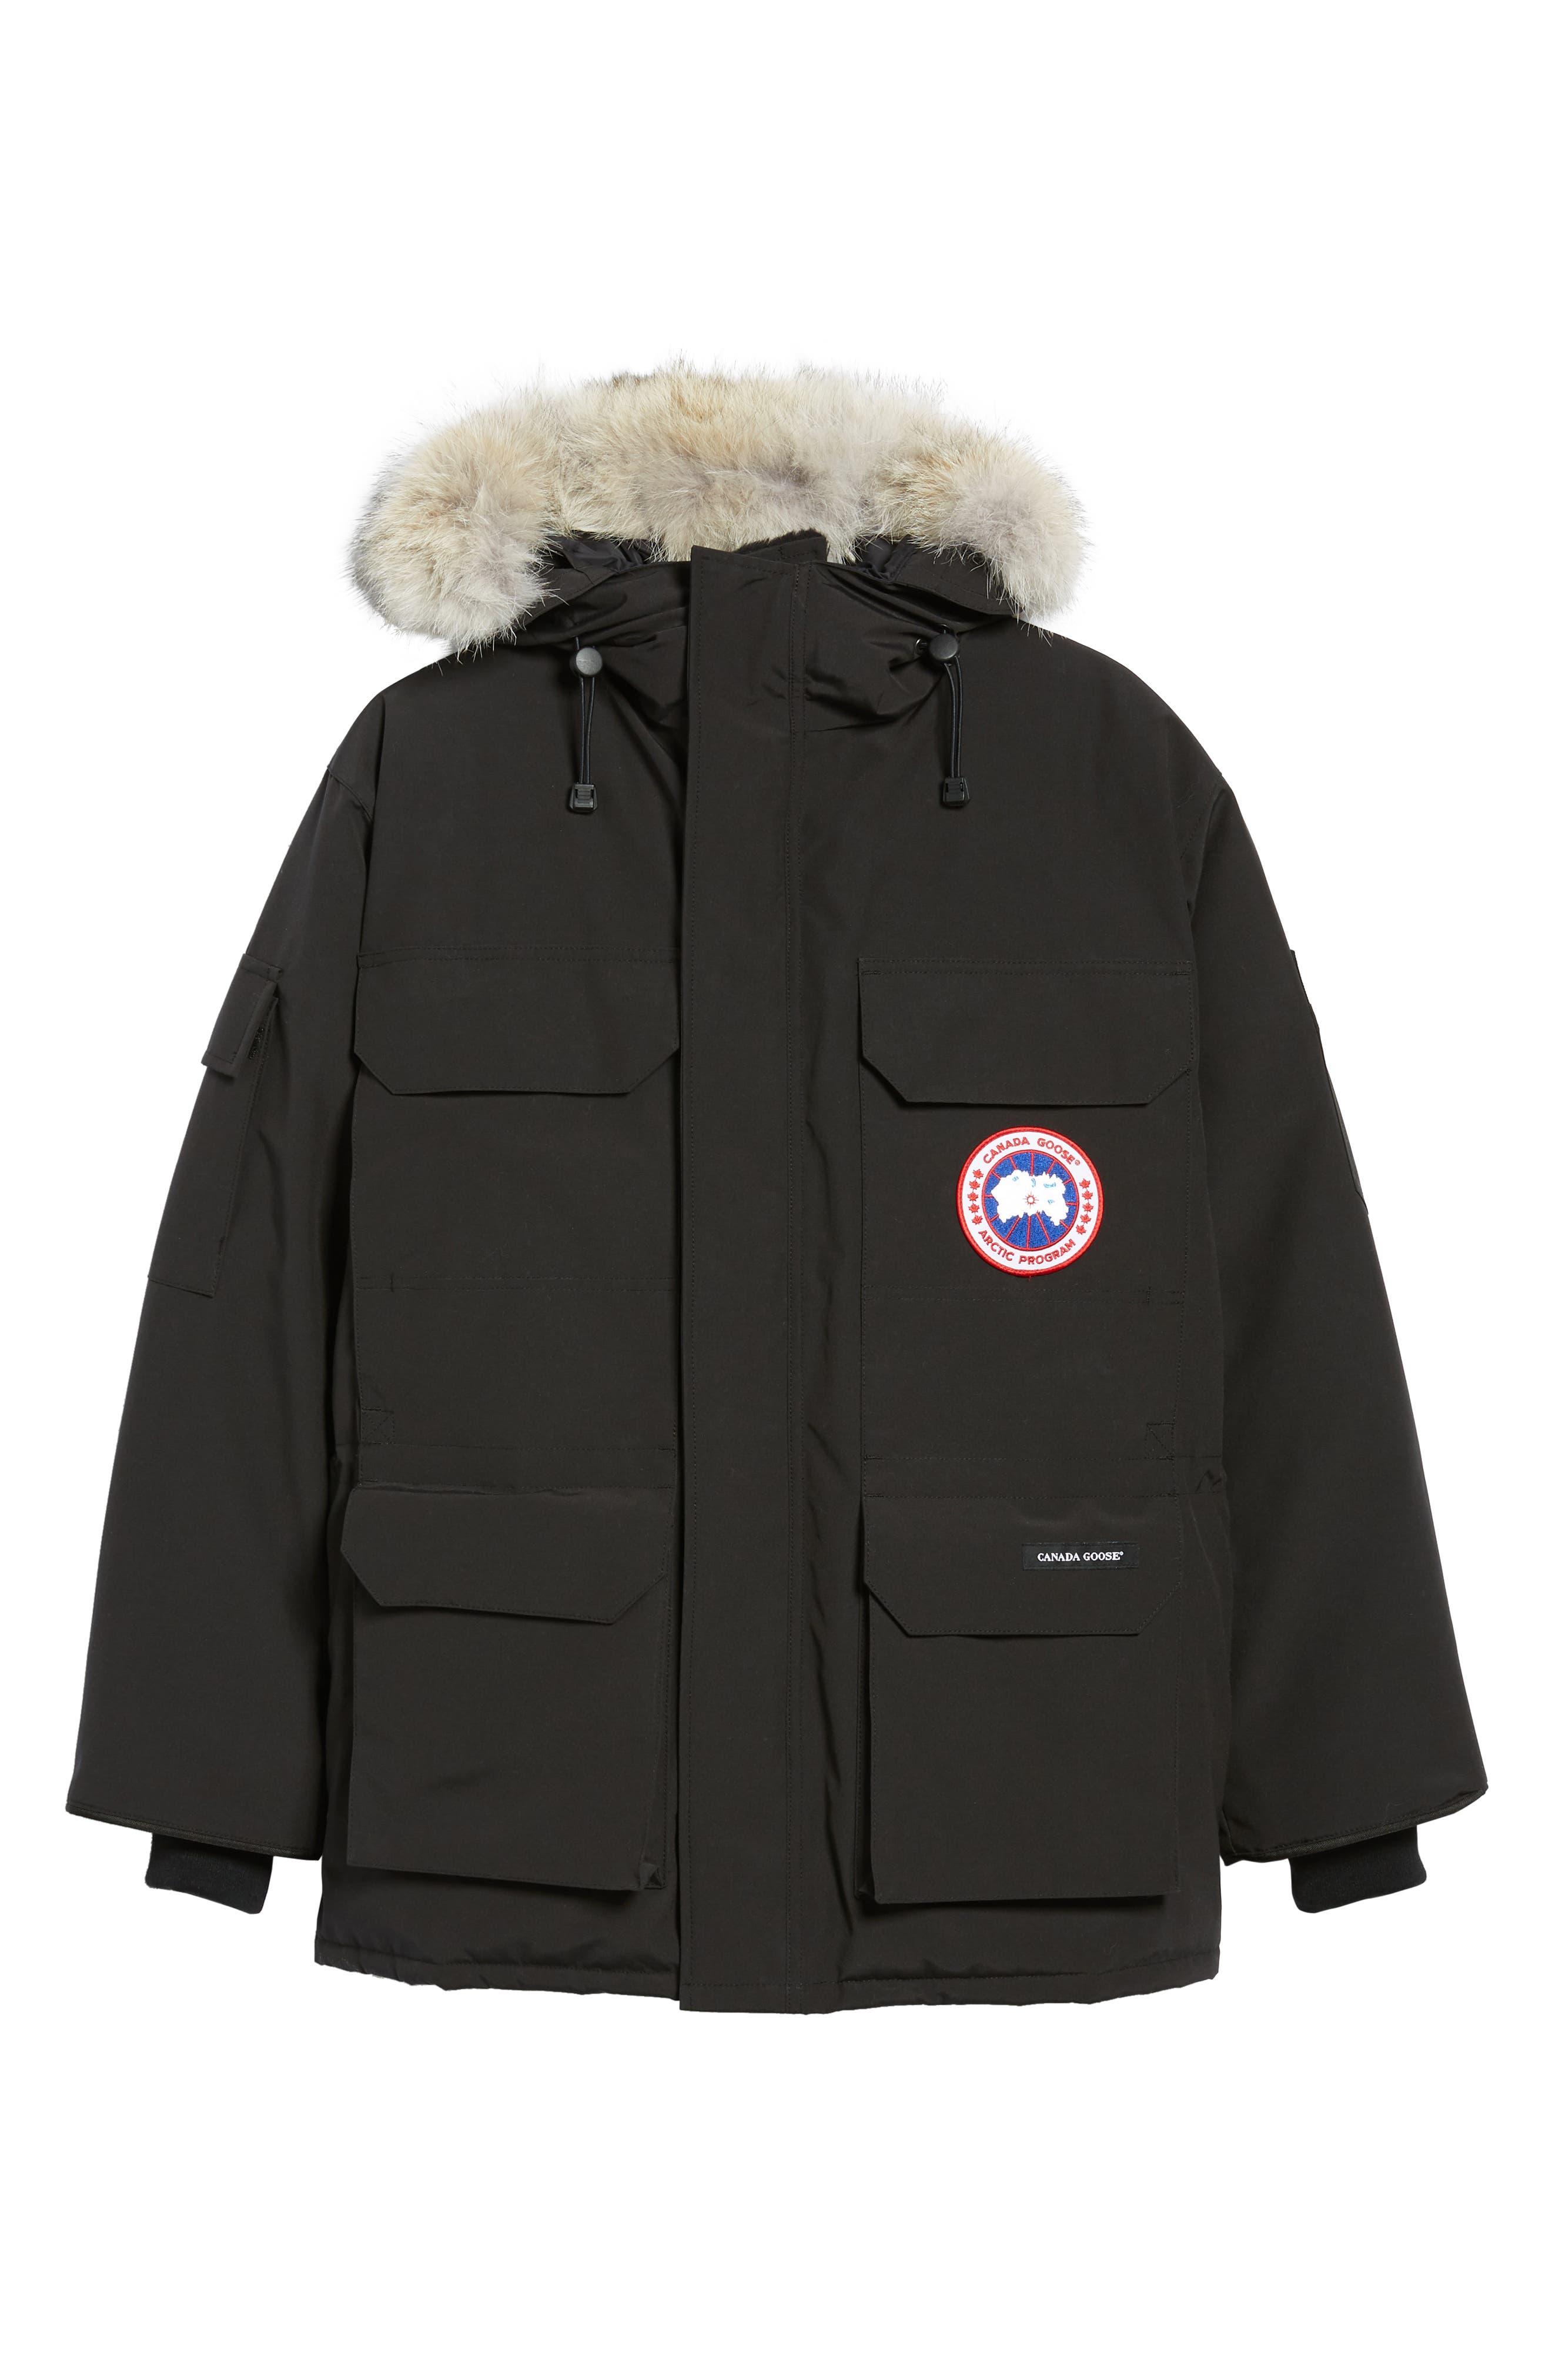 CANADA GOOSE, PBI Expedition Regular Fit Down Parka with Genuine Coyote Fur Trim, Alternate thumbnail 6, color, BLACK